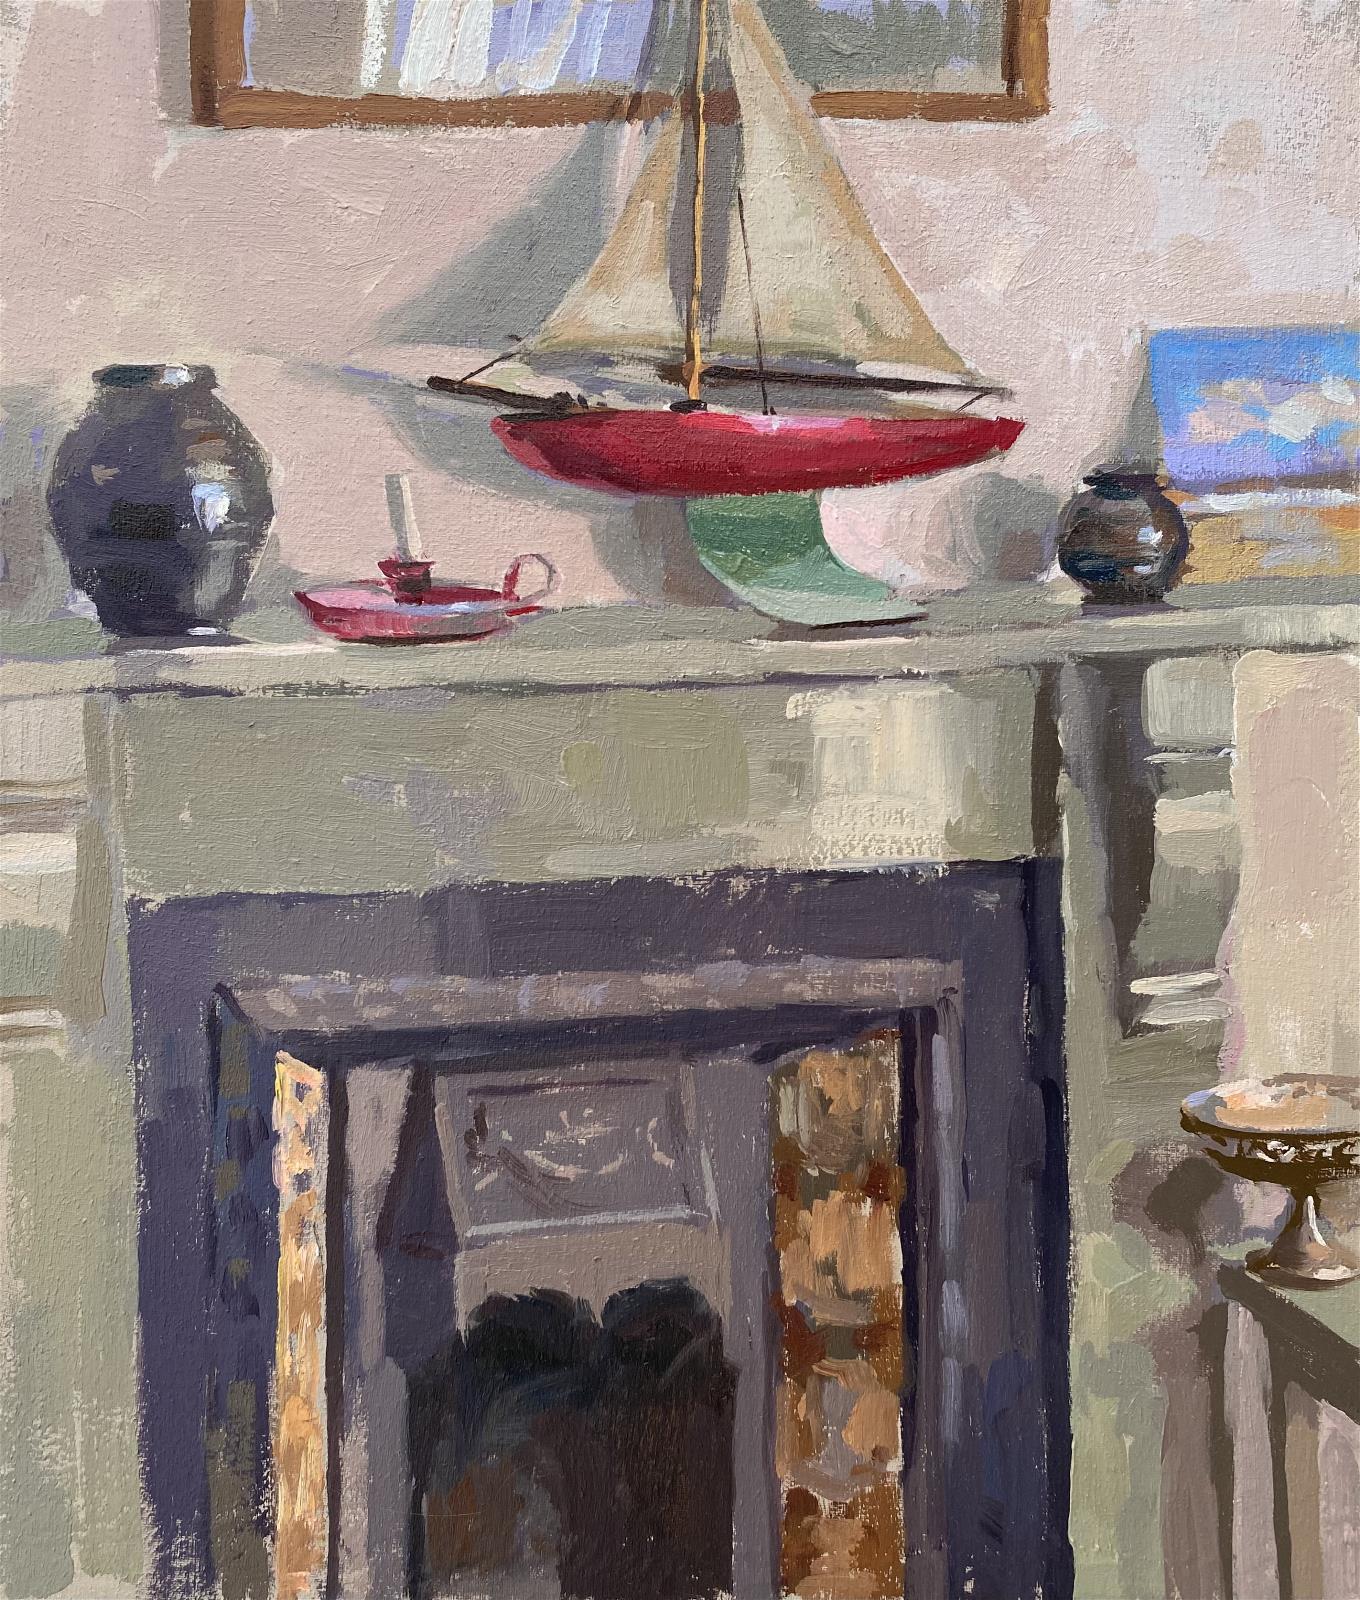 Summers Cottage Interior, Appledore, Jo Haidee